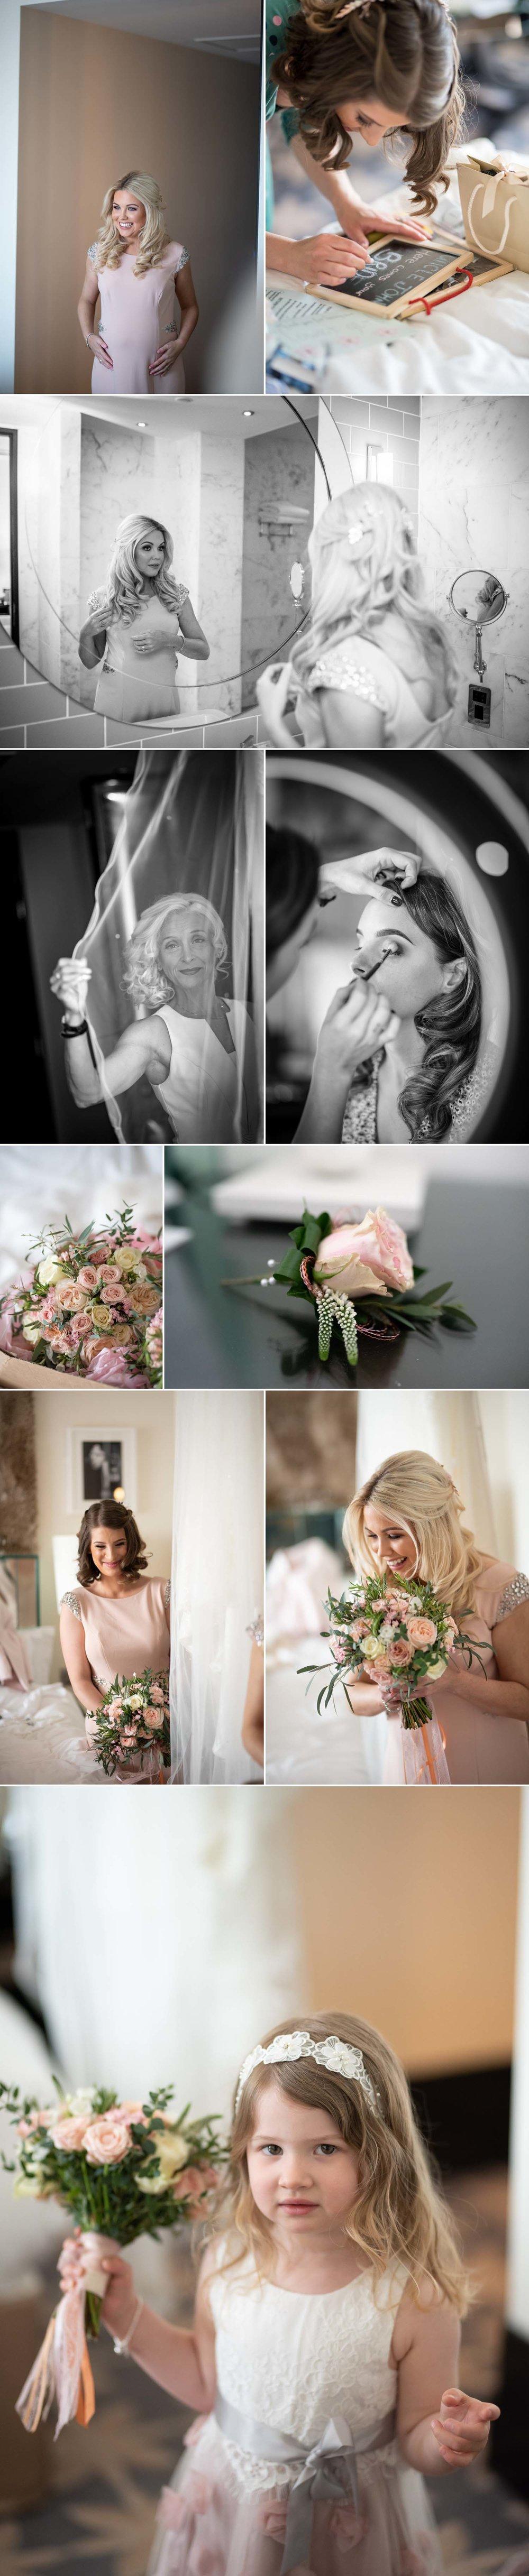 Merchant Hotel Belfast Wedding Photography James McGrillis 04.jpg